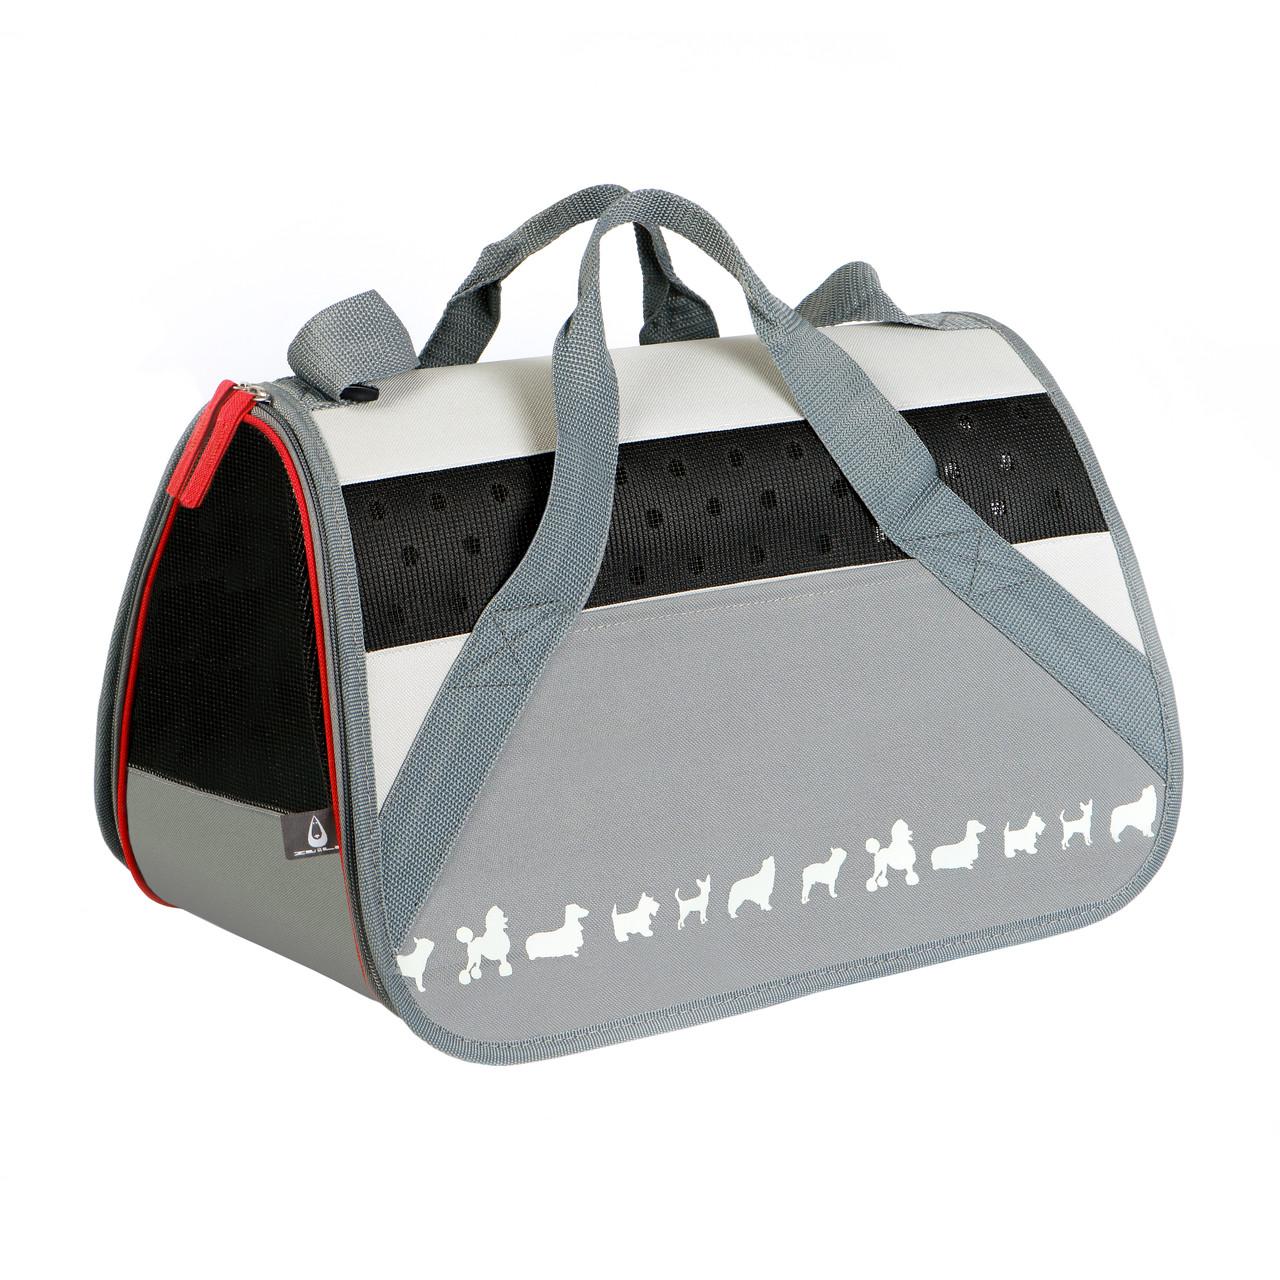 Сумка-переноска для собак и кошек Collar 42х24х26 см до 6 кг